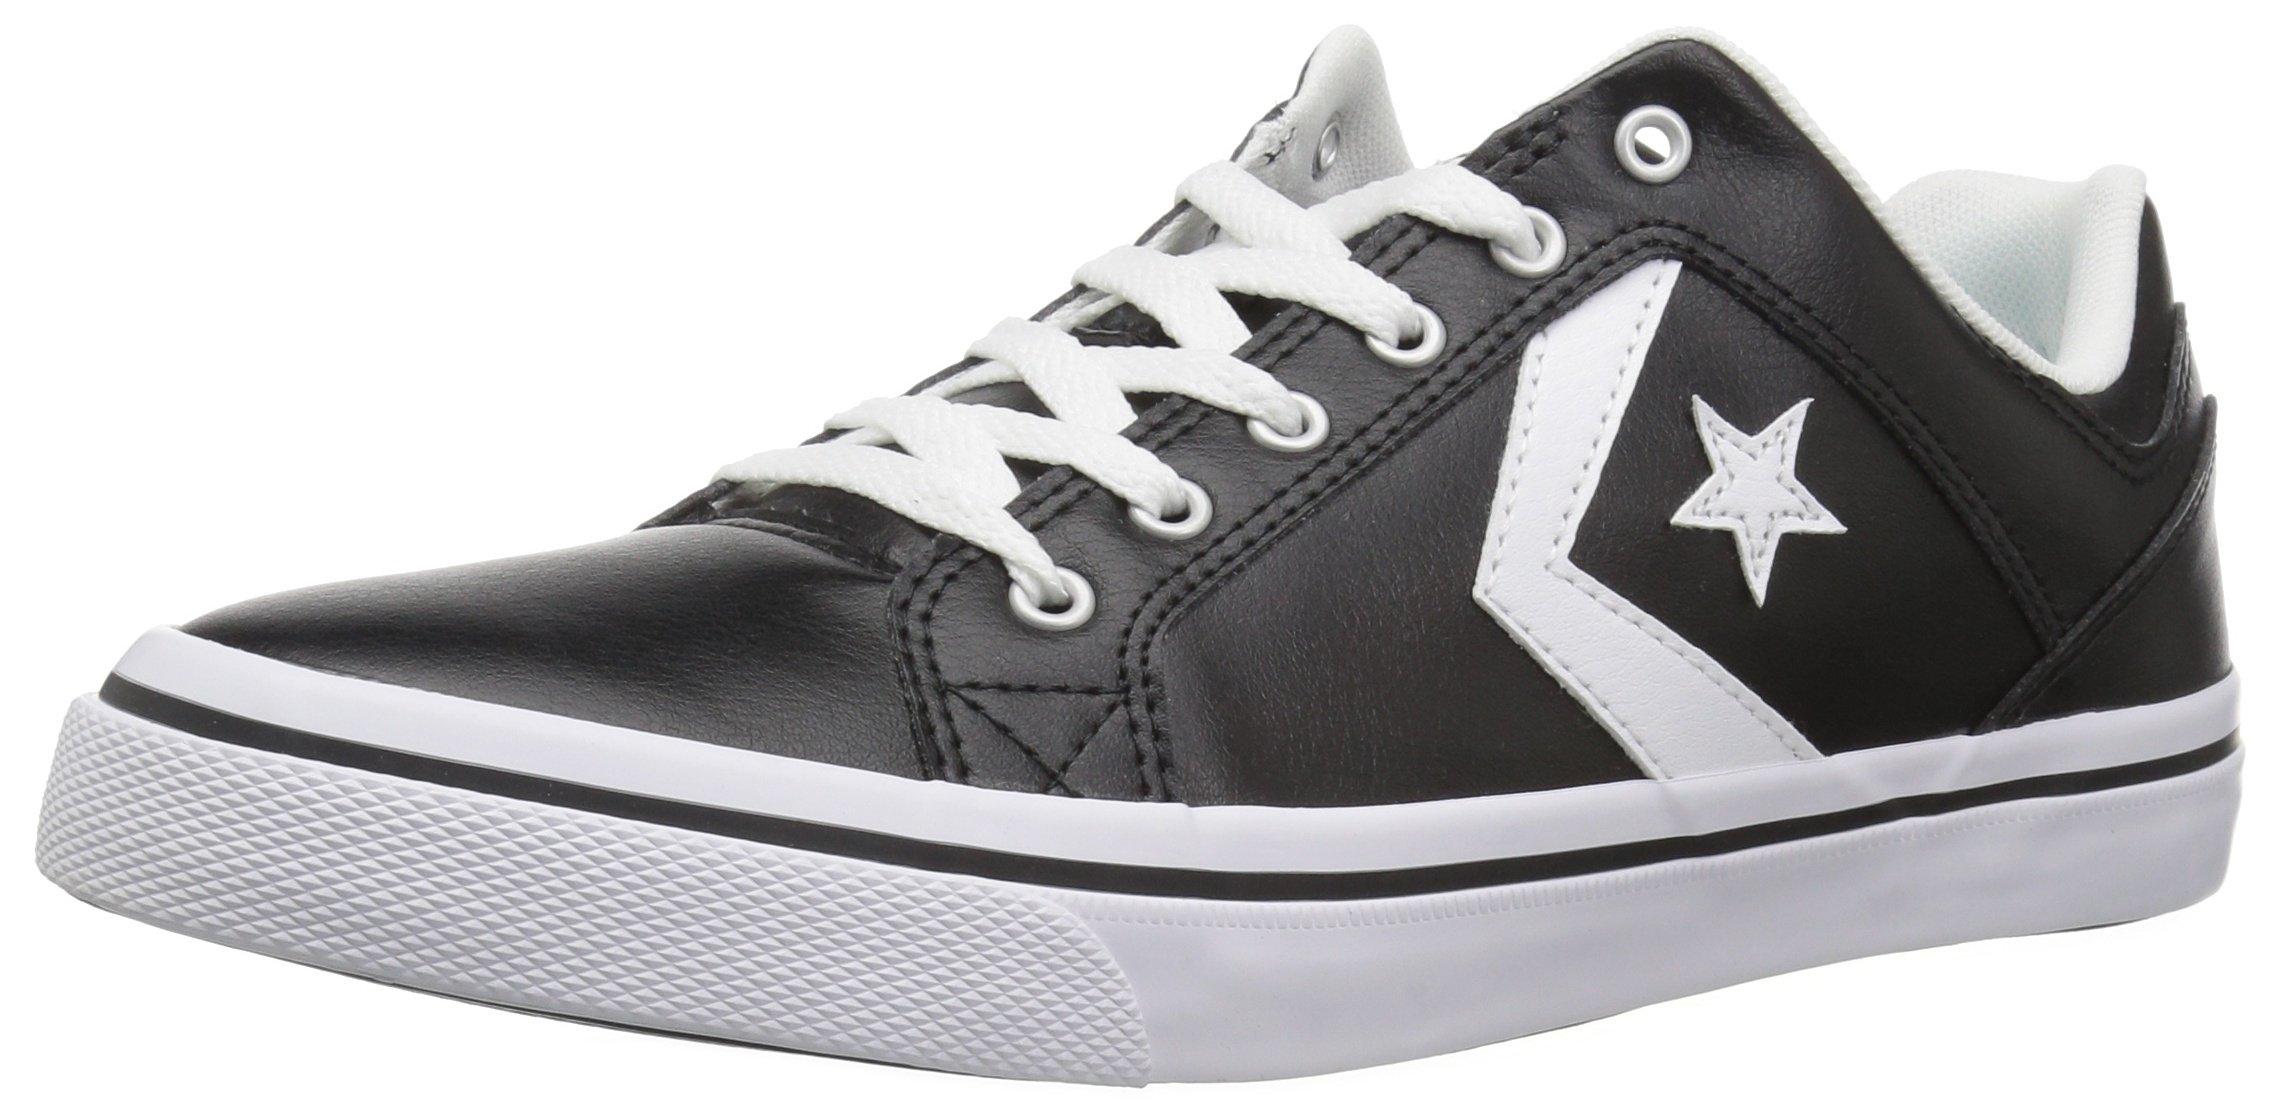 Converse EL Distrito Leather Low Top Sneaker Black/White/Black Size 8 M US